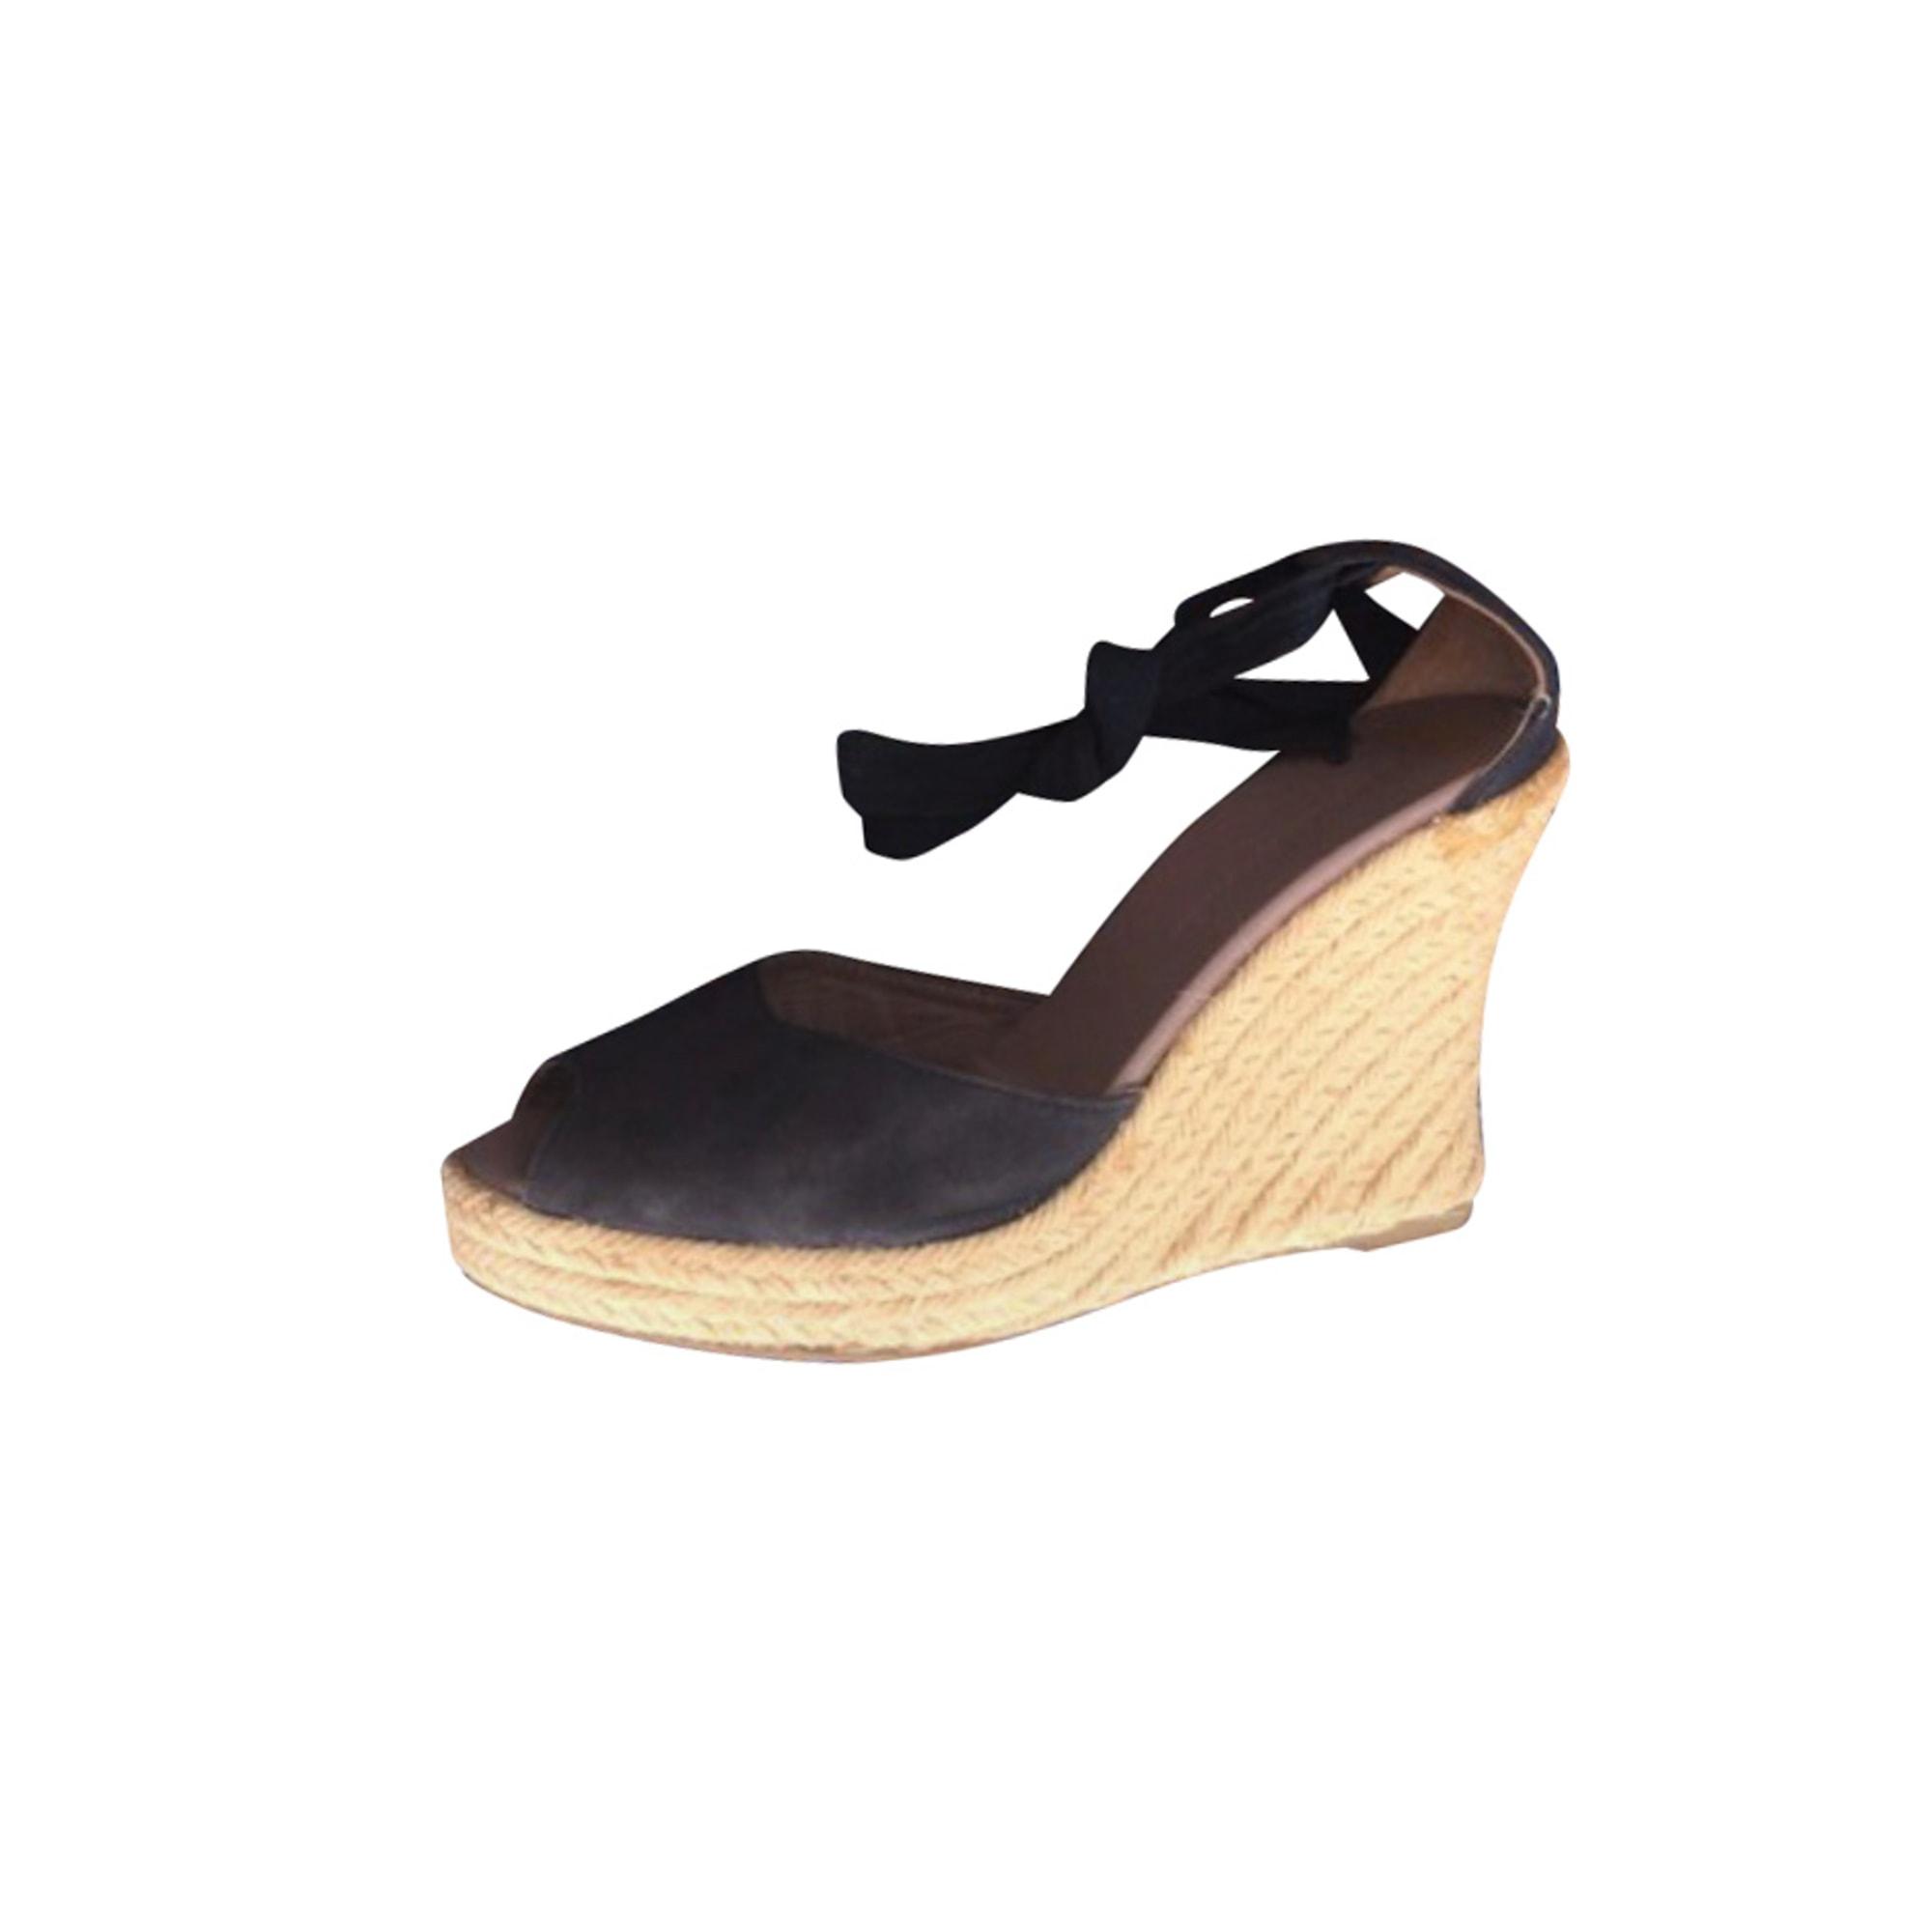 Wedge Sandals SONIA RYKIEL Blue, navy, turquoise